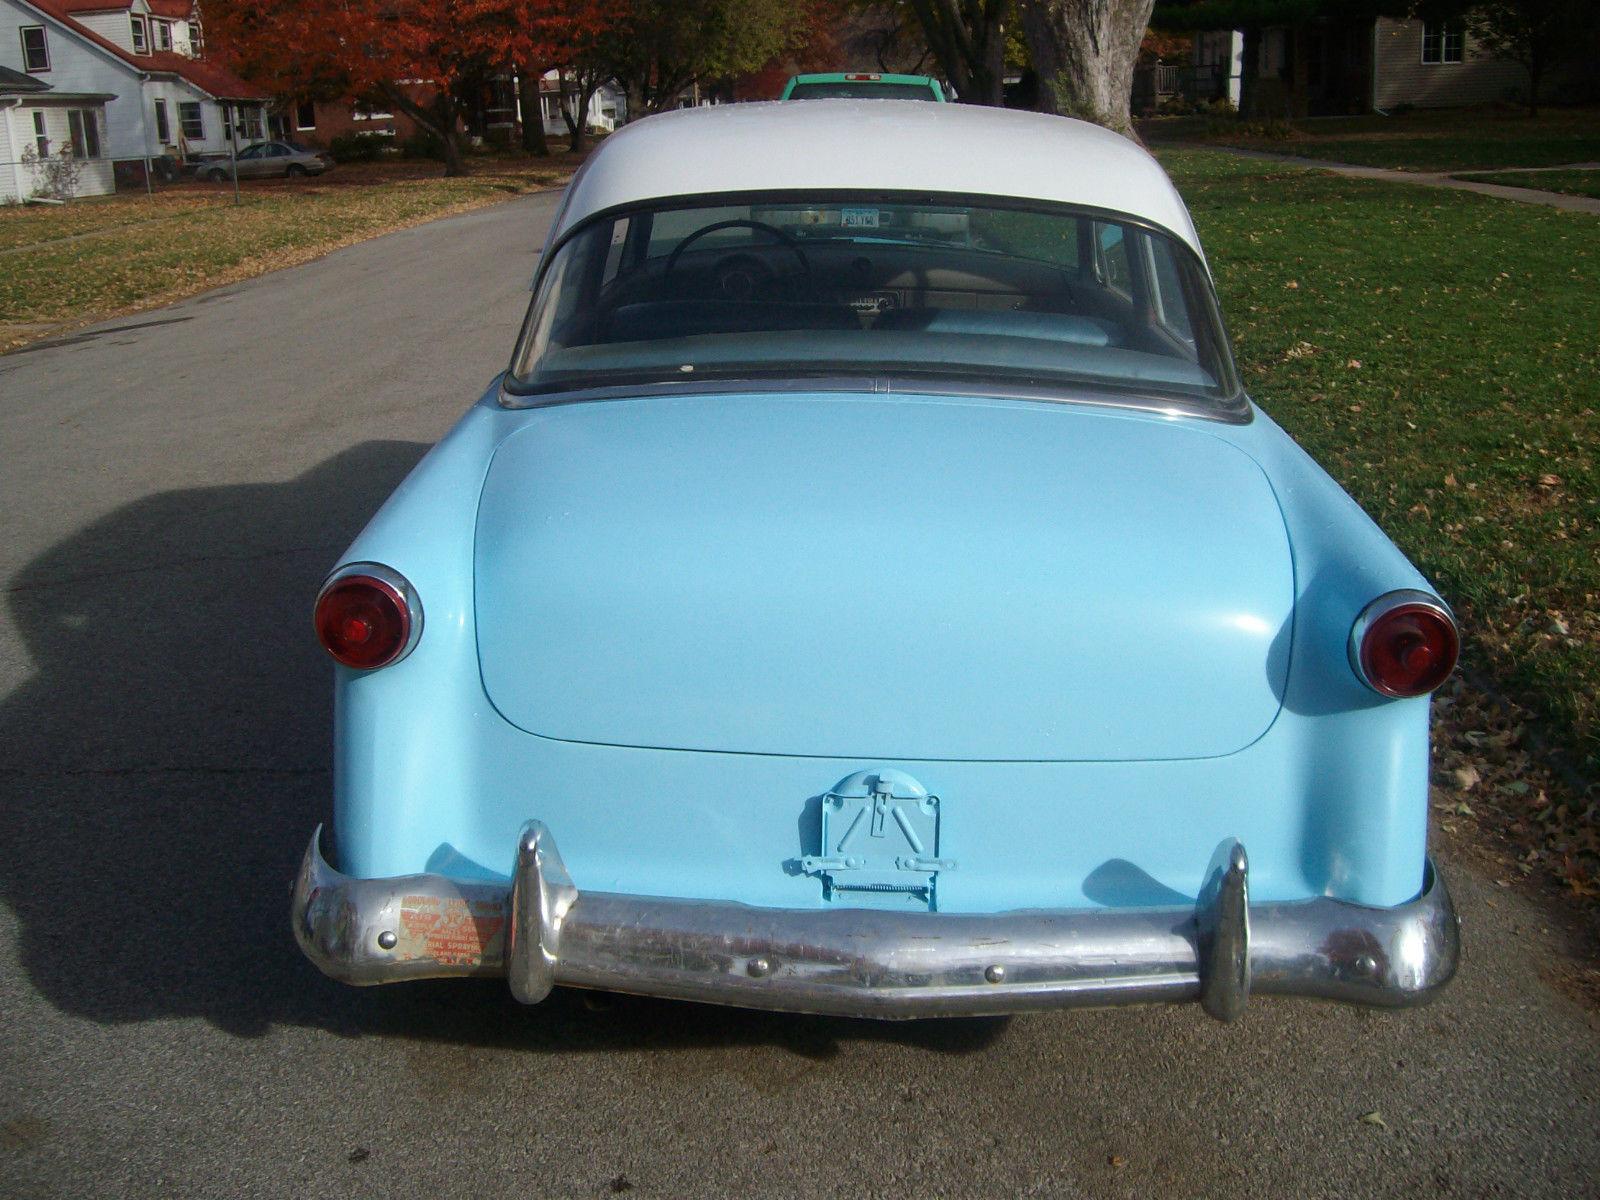 1953 53 Ford Mainline Custom Hot Rod 2 Door Sedan Cruiser Classic 1954 Main Line Prevnext